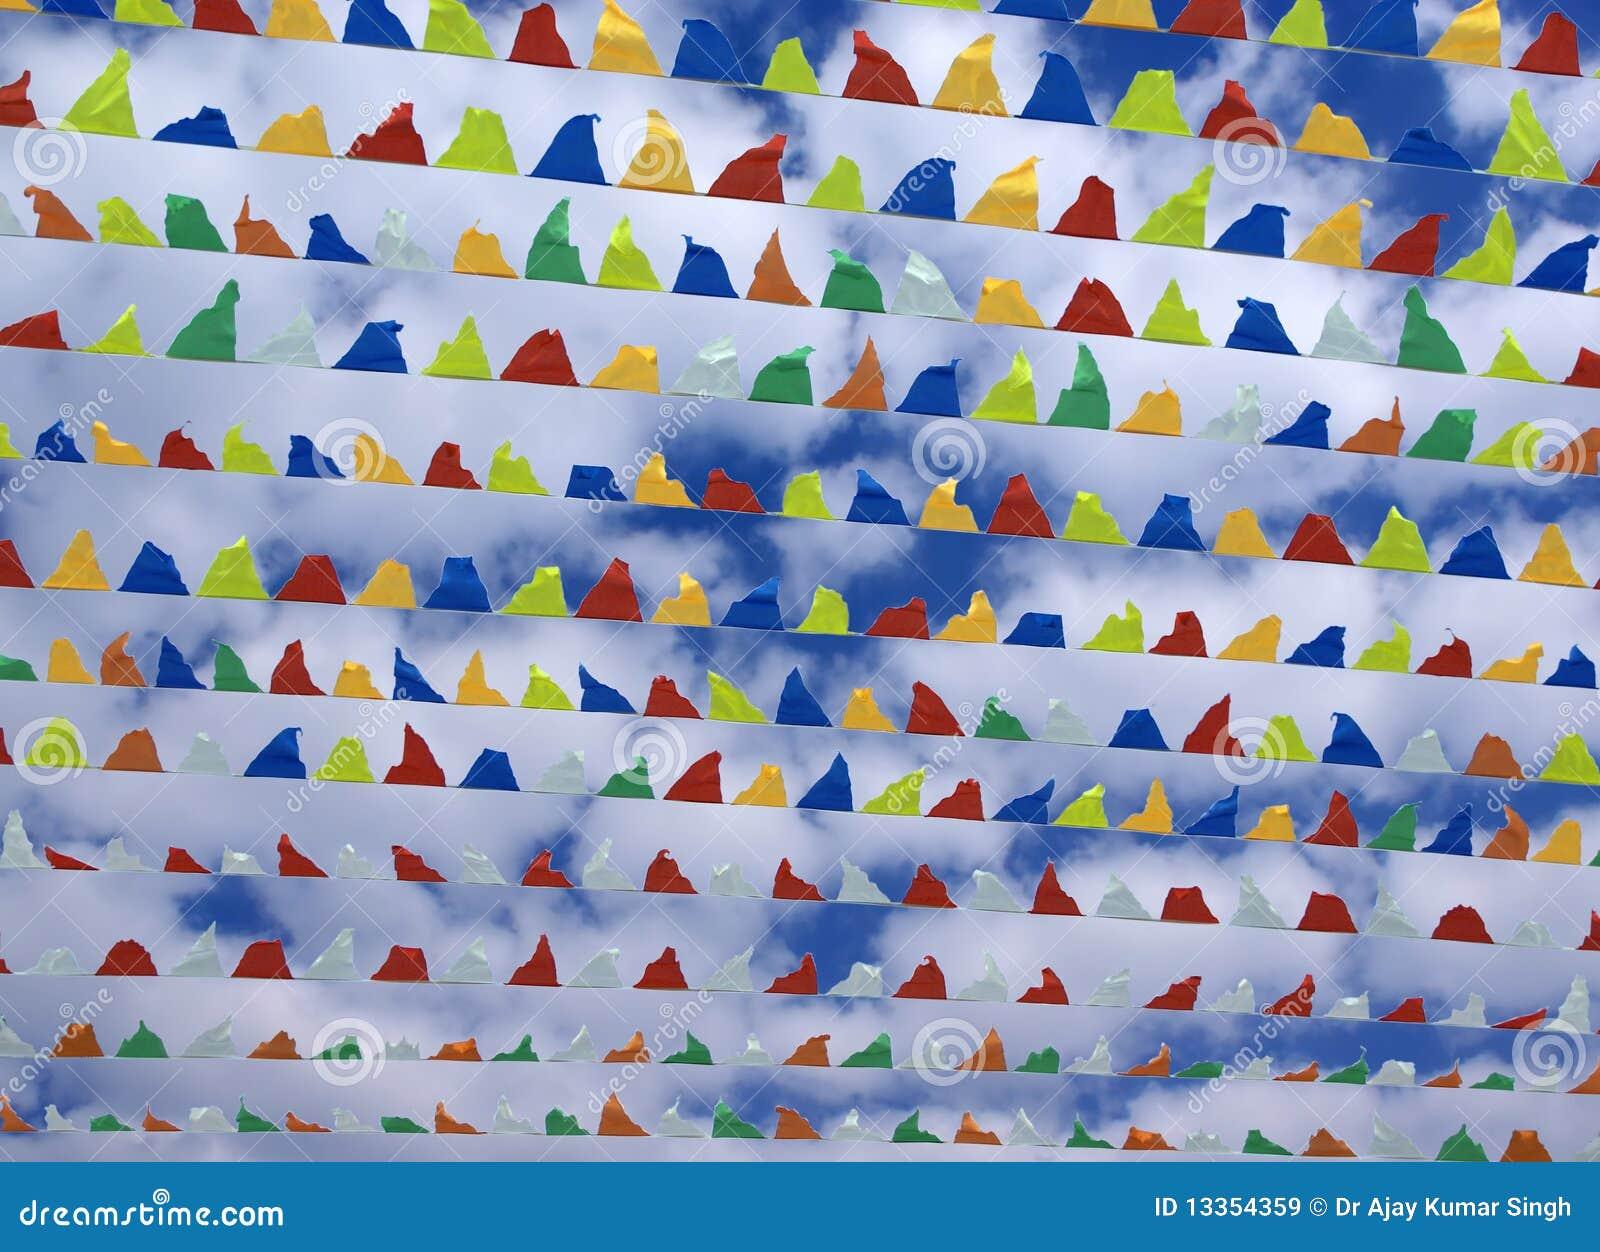 Colourful Triangular Decorative Flags Stock Image Image Of